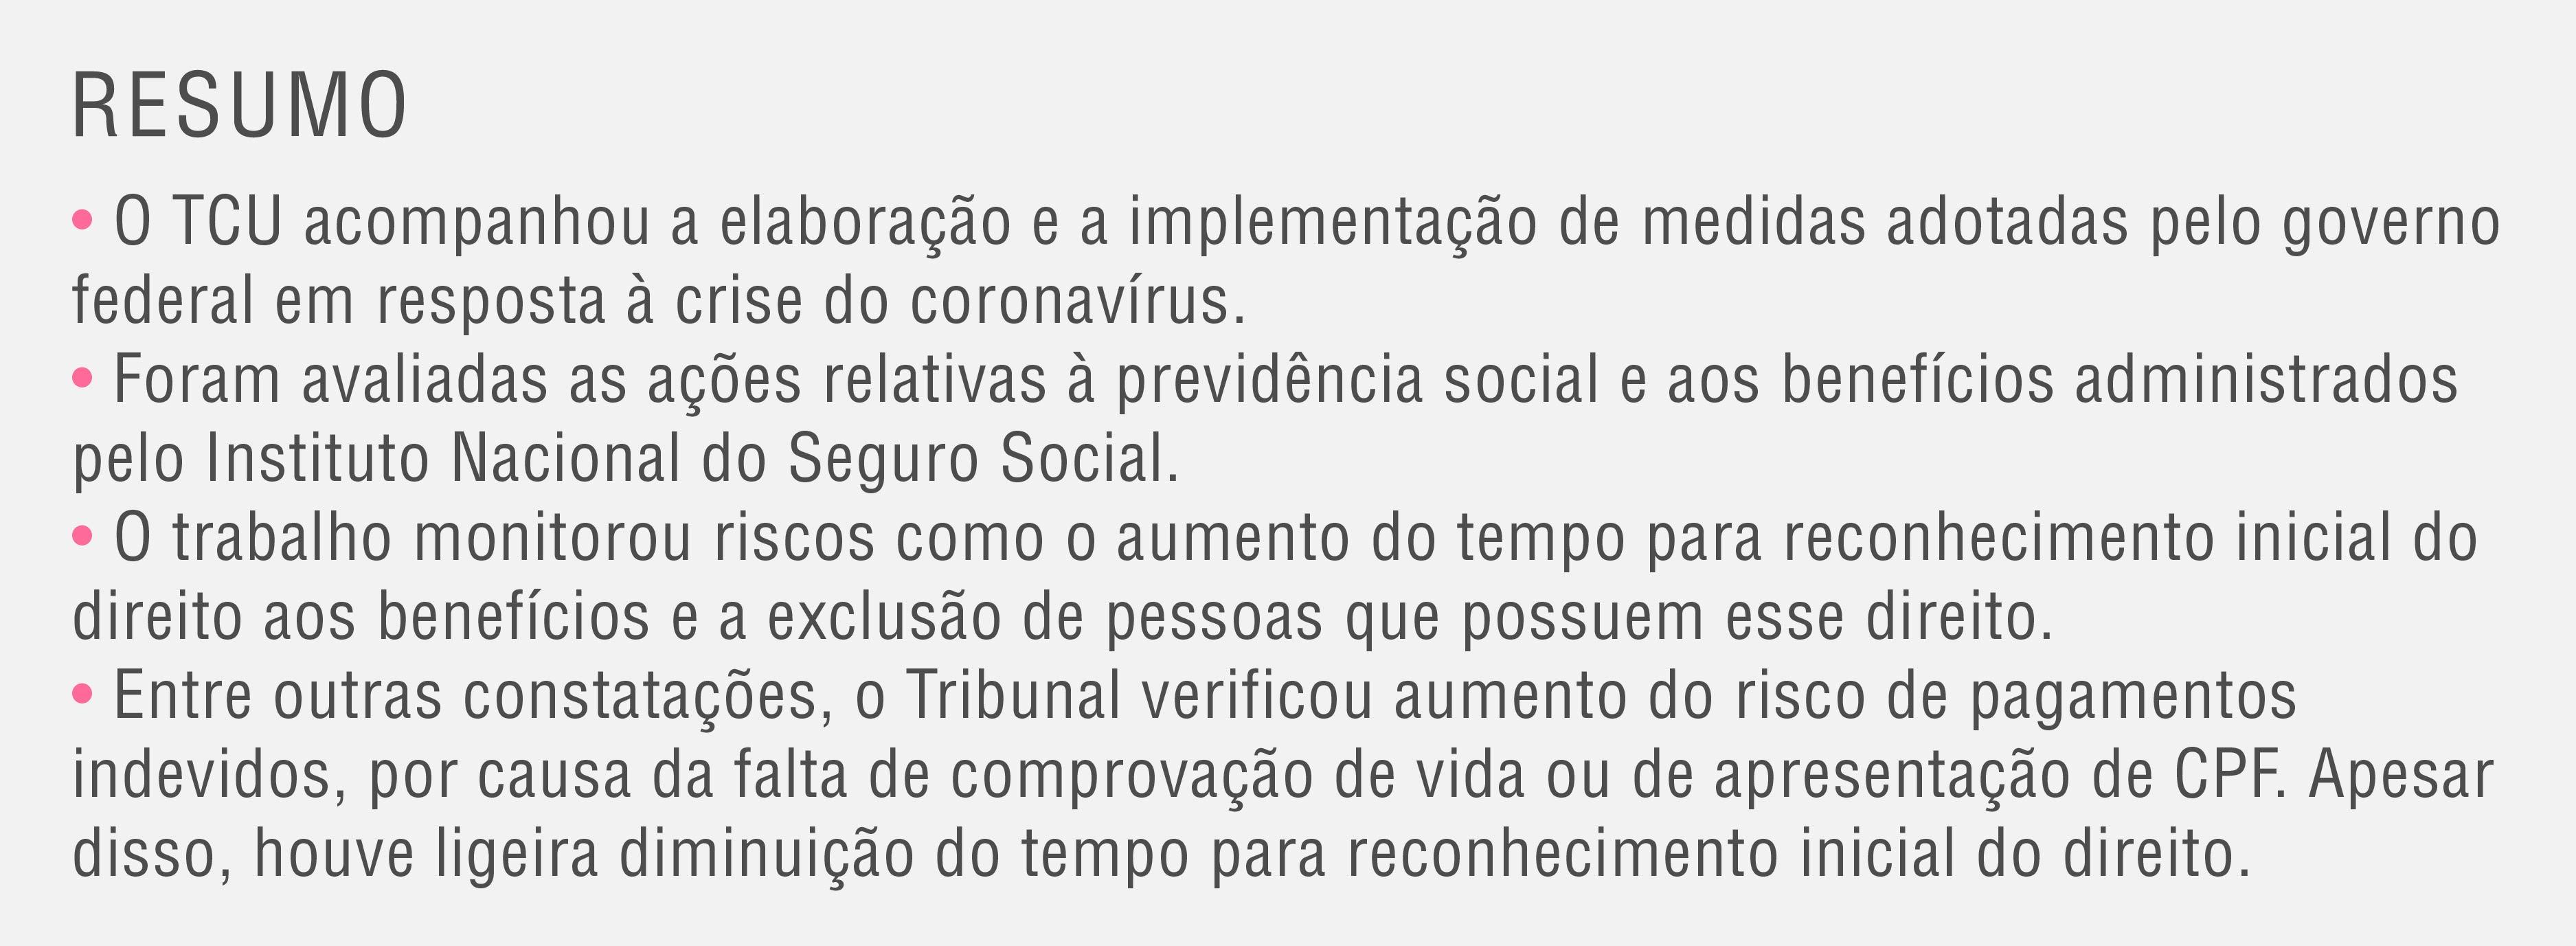 Quadro_resumo_medidas adotadas-01.jpg